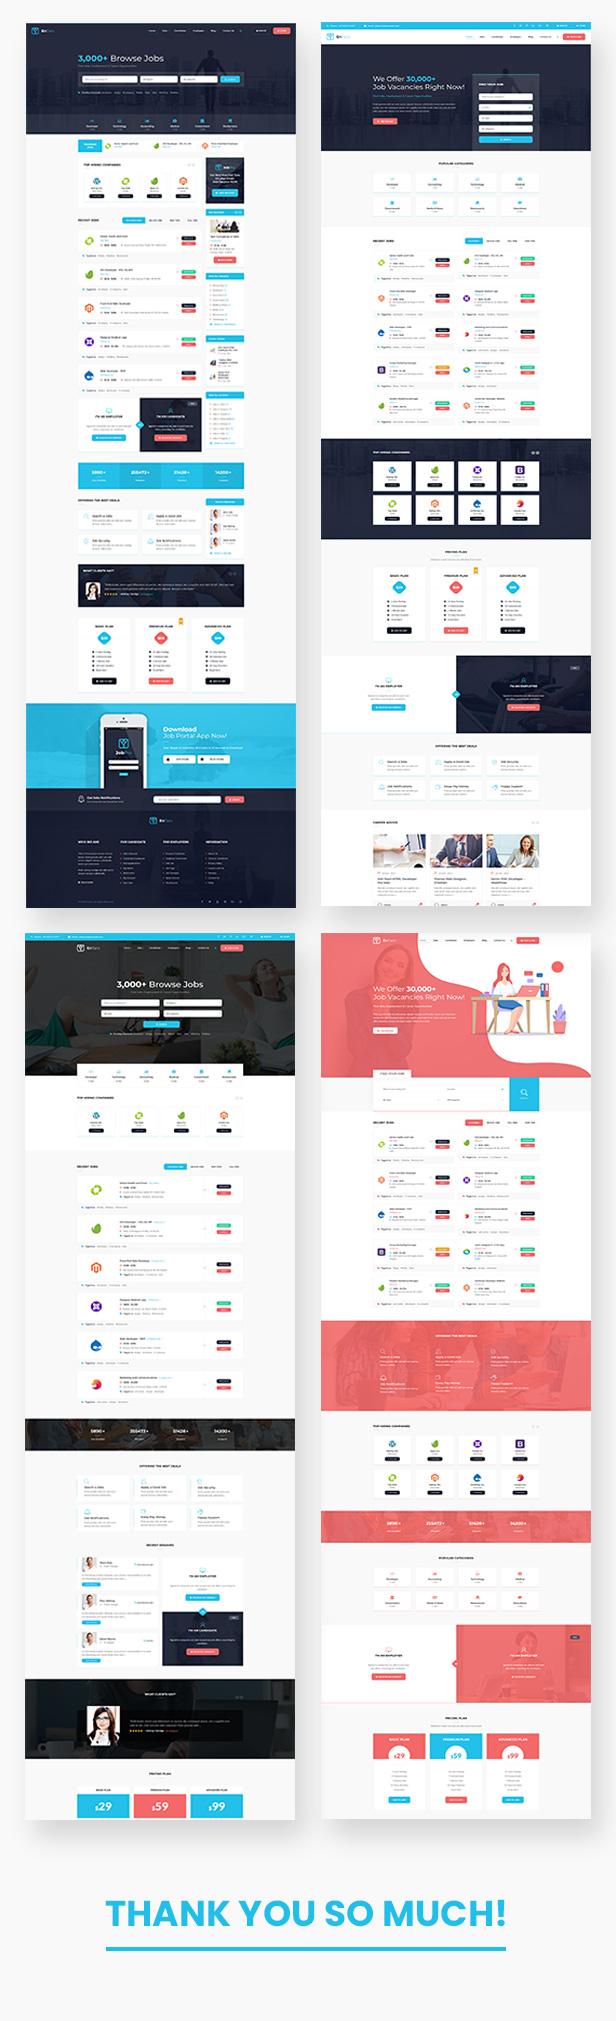 Entaro - Job Portal WordPress Theme - 1